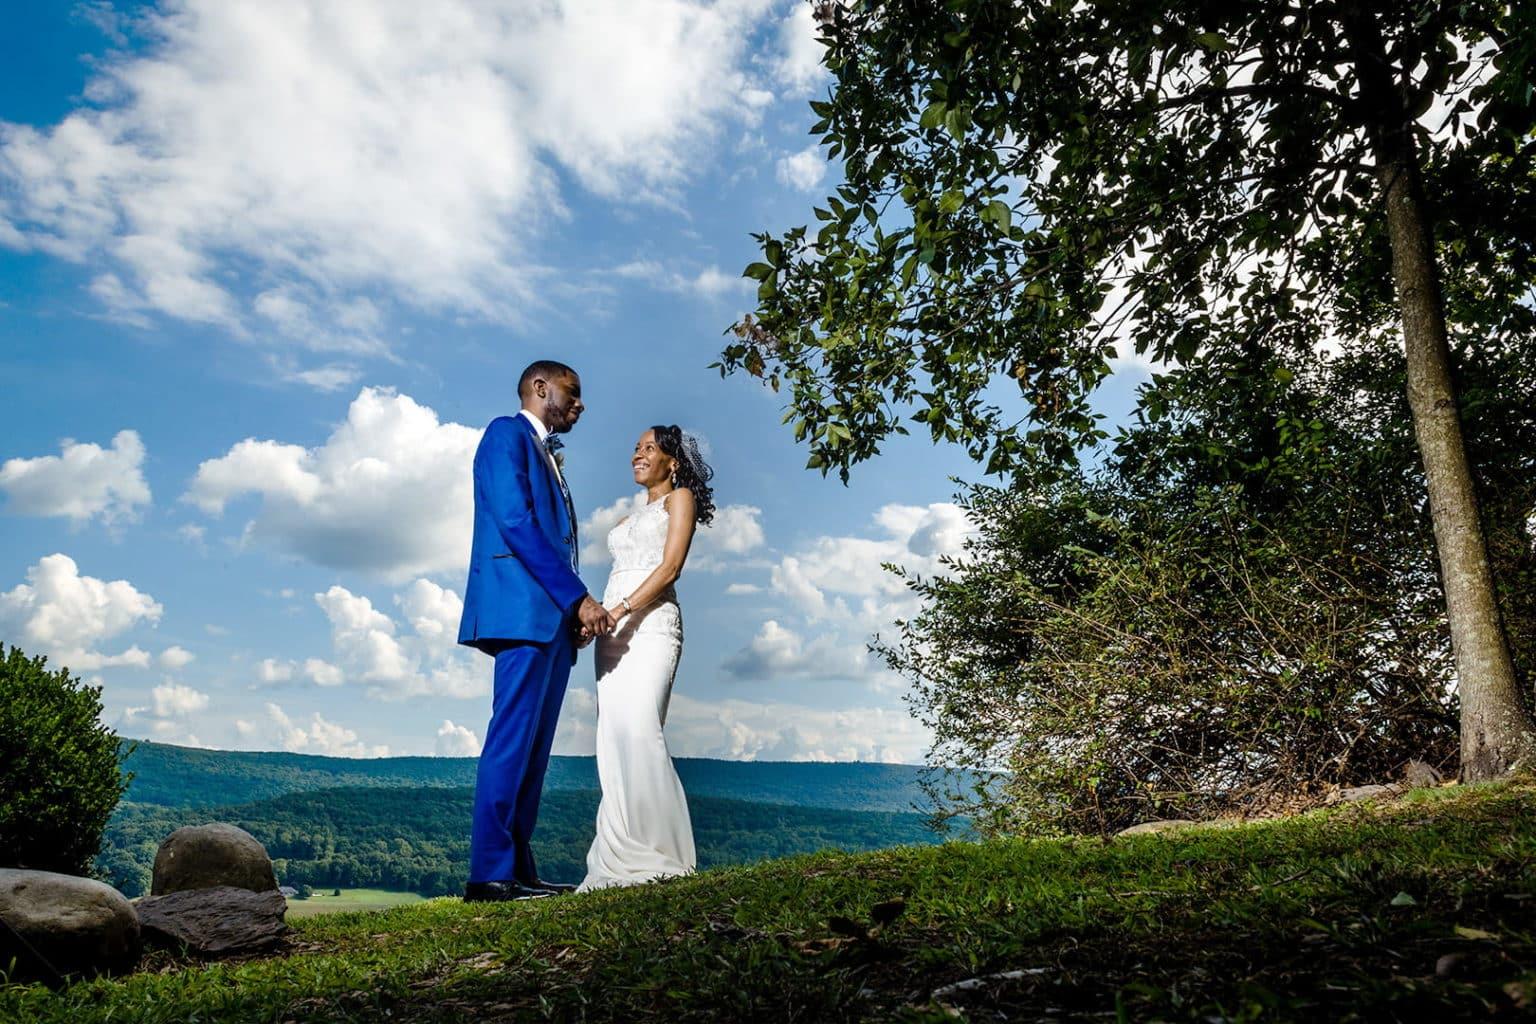 cordero-carty-wedding-outdoor-ridgecrest-min